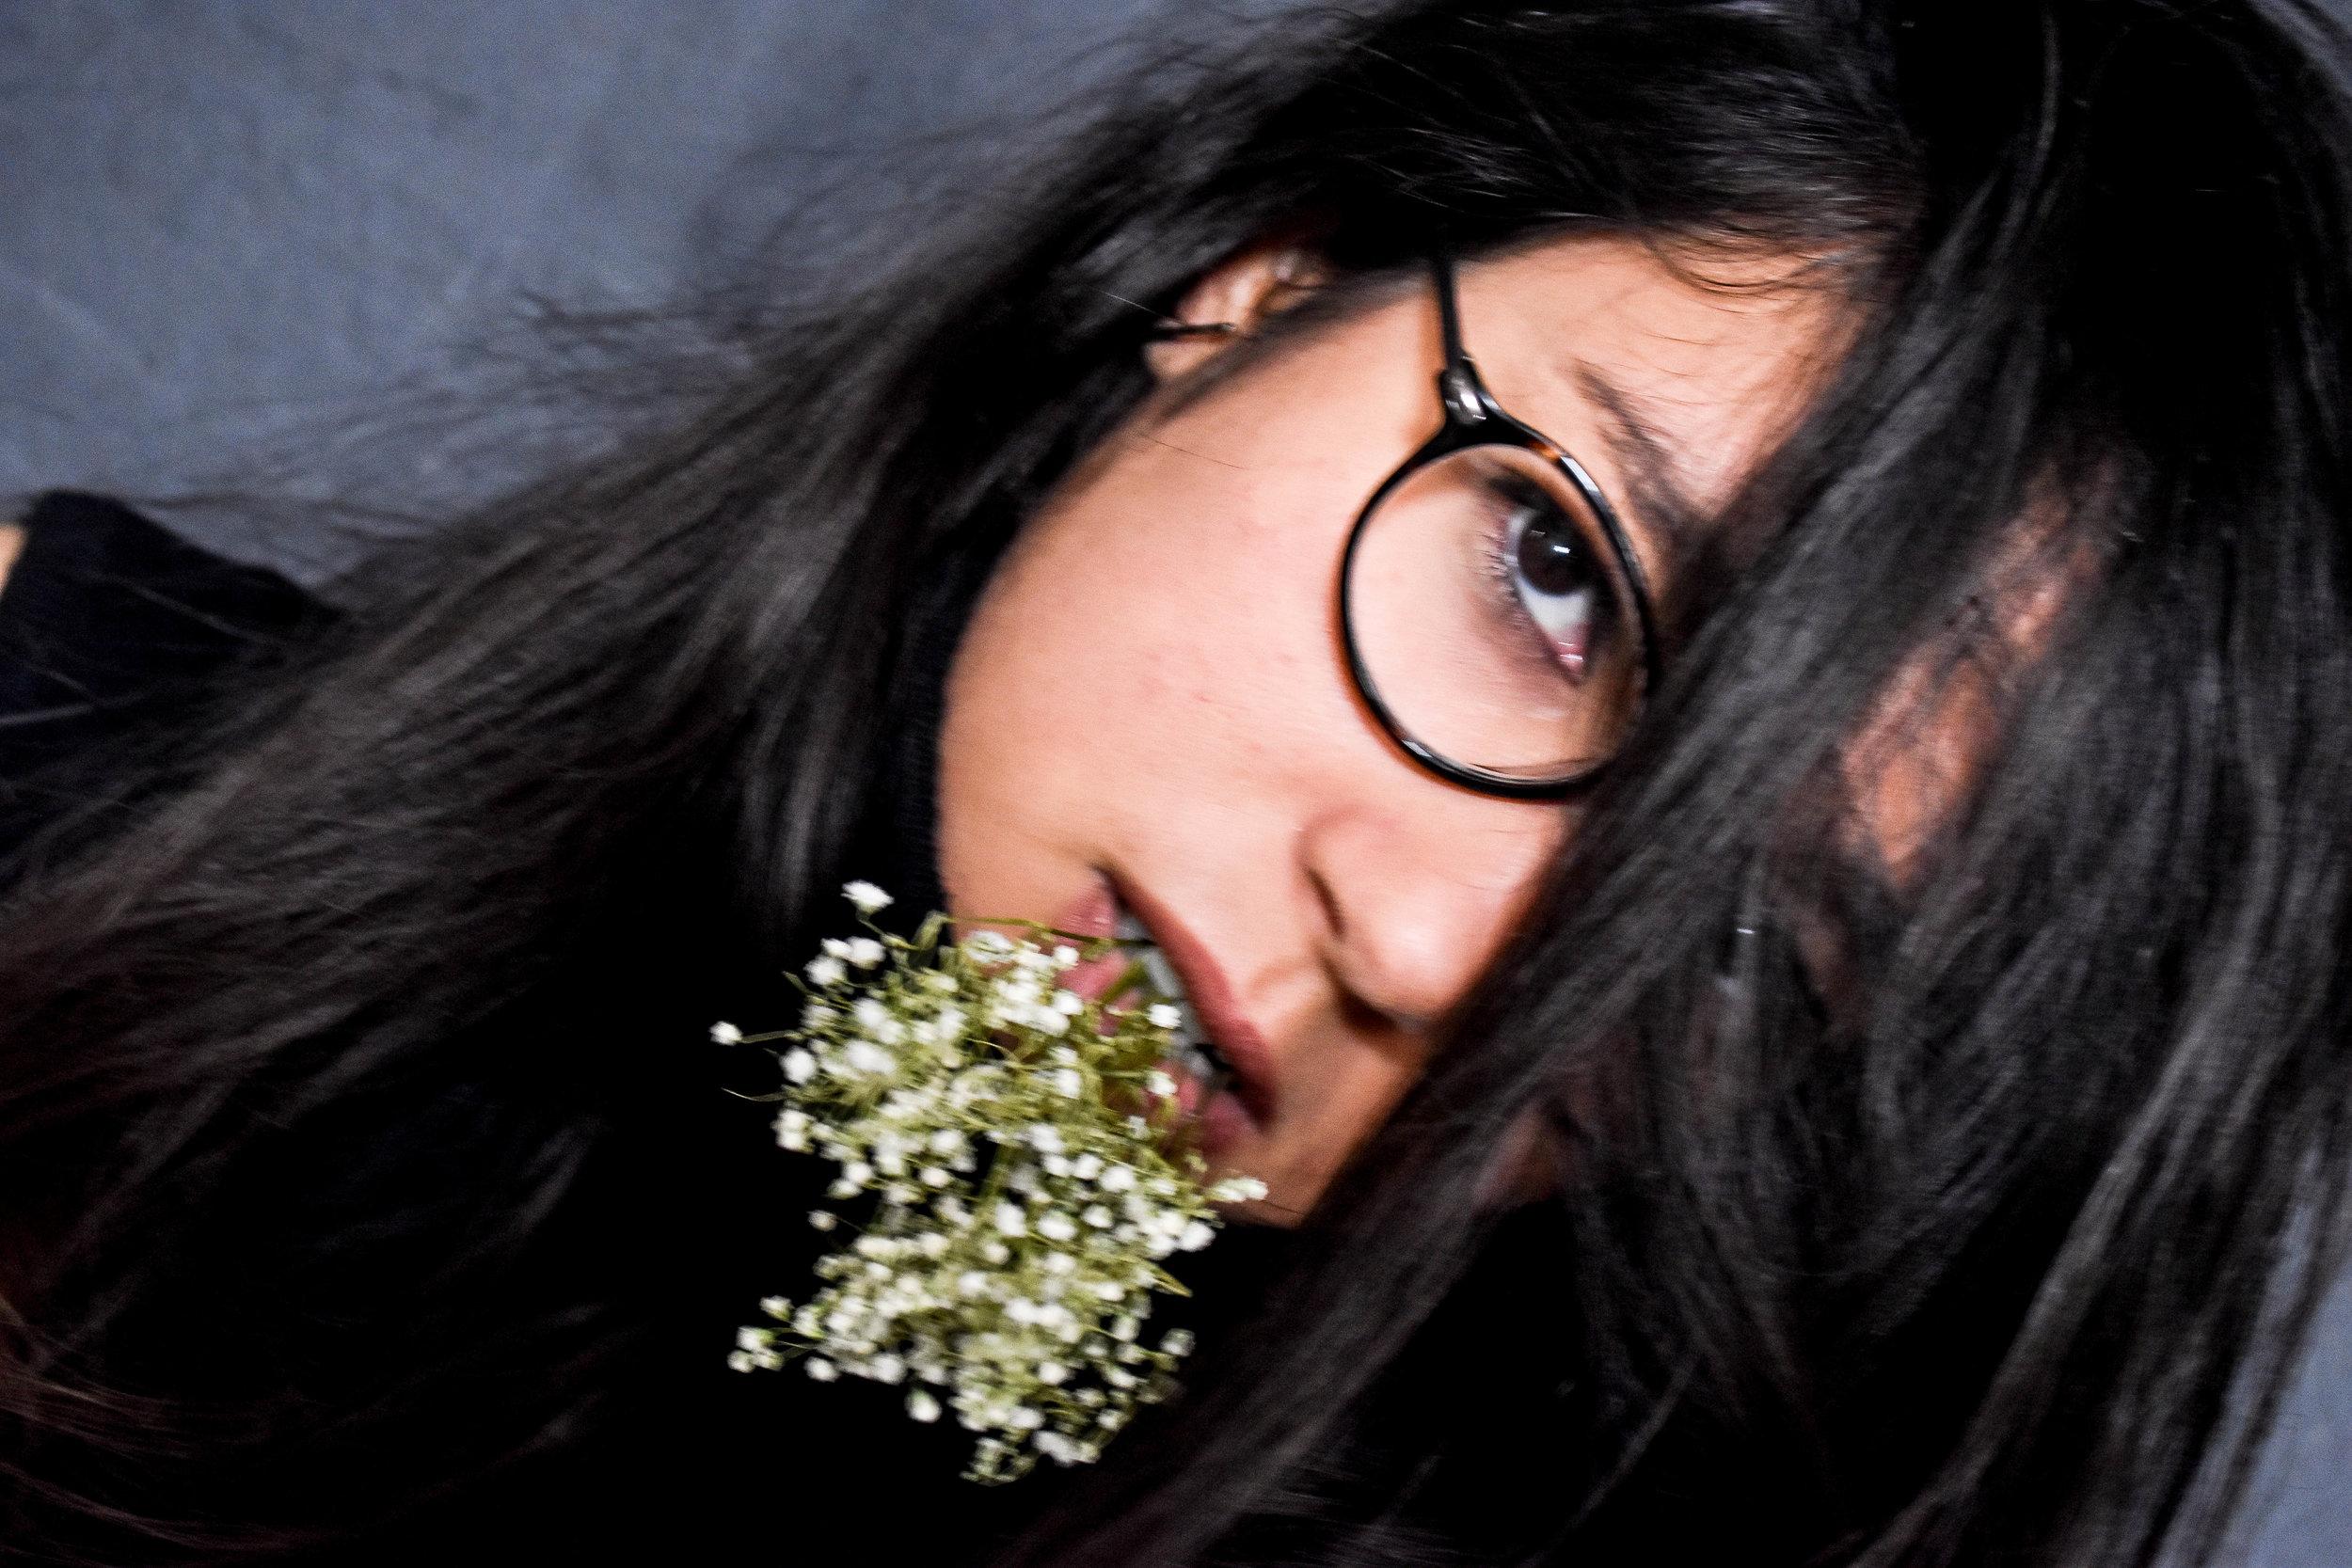 flowered truth 4